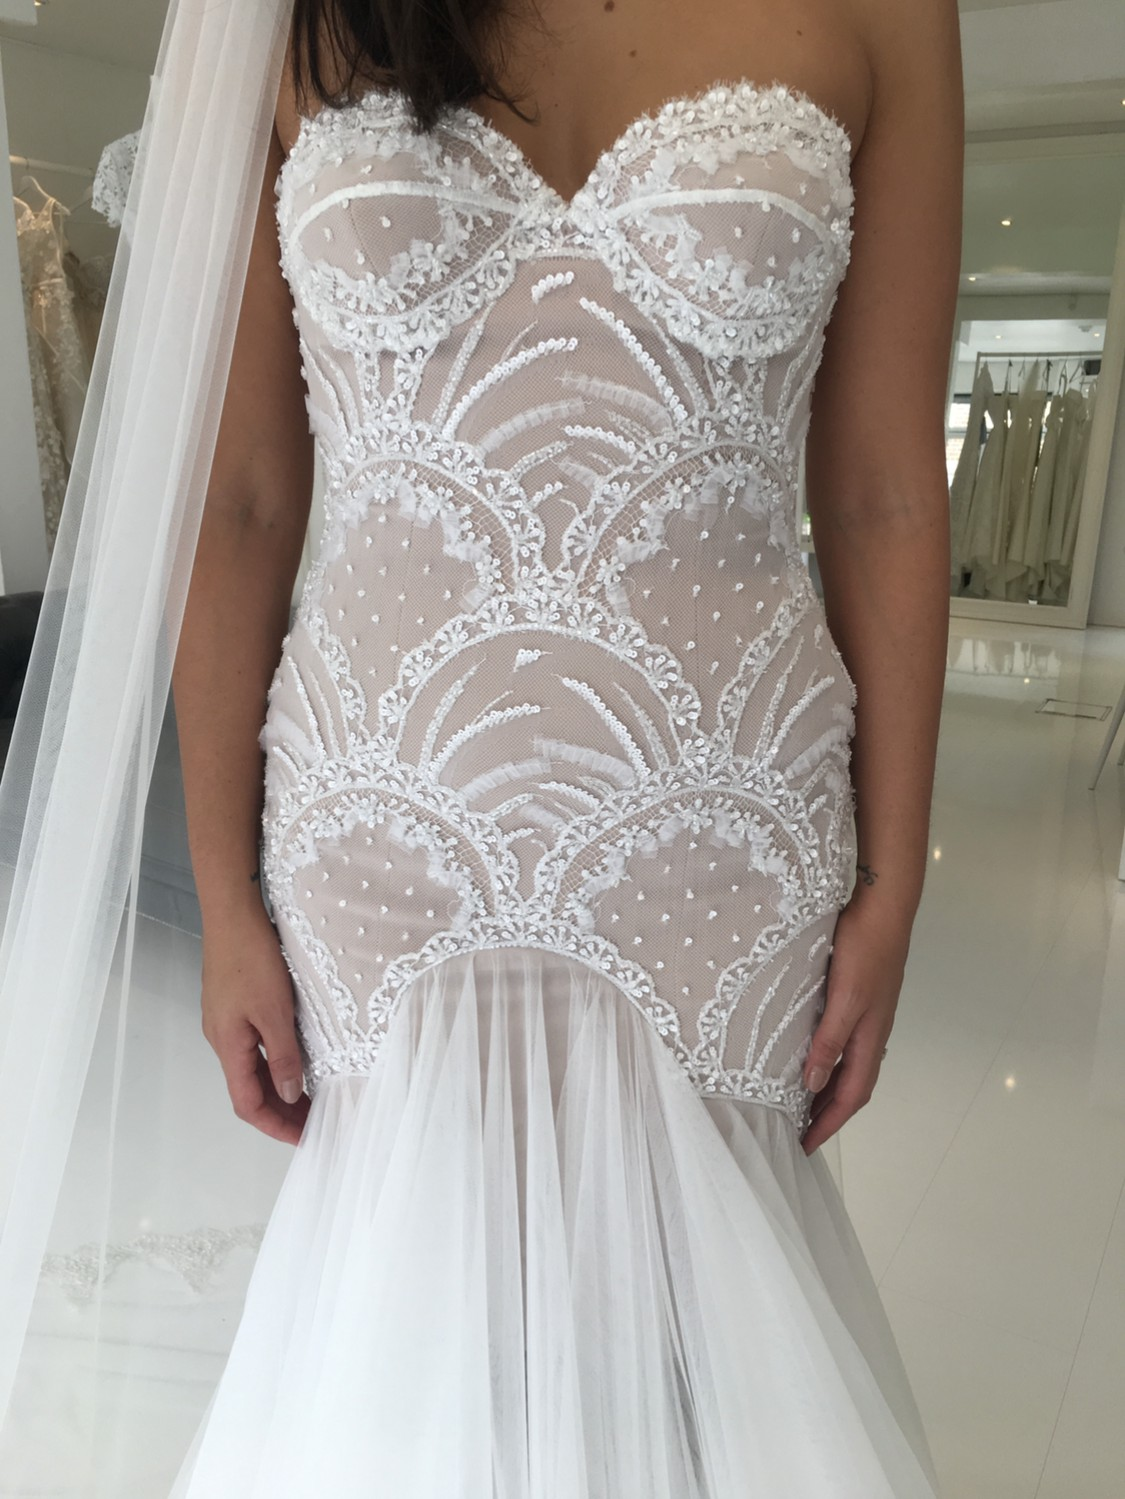 J Aton Preowned Wedding Dress Stillwhite,Fall Wedding Guest Dress Ideas